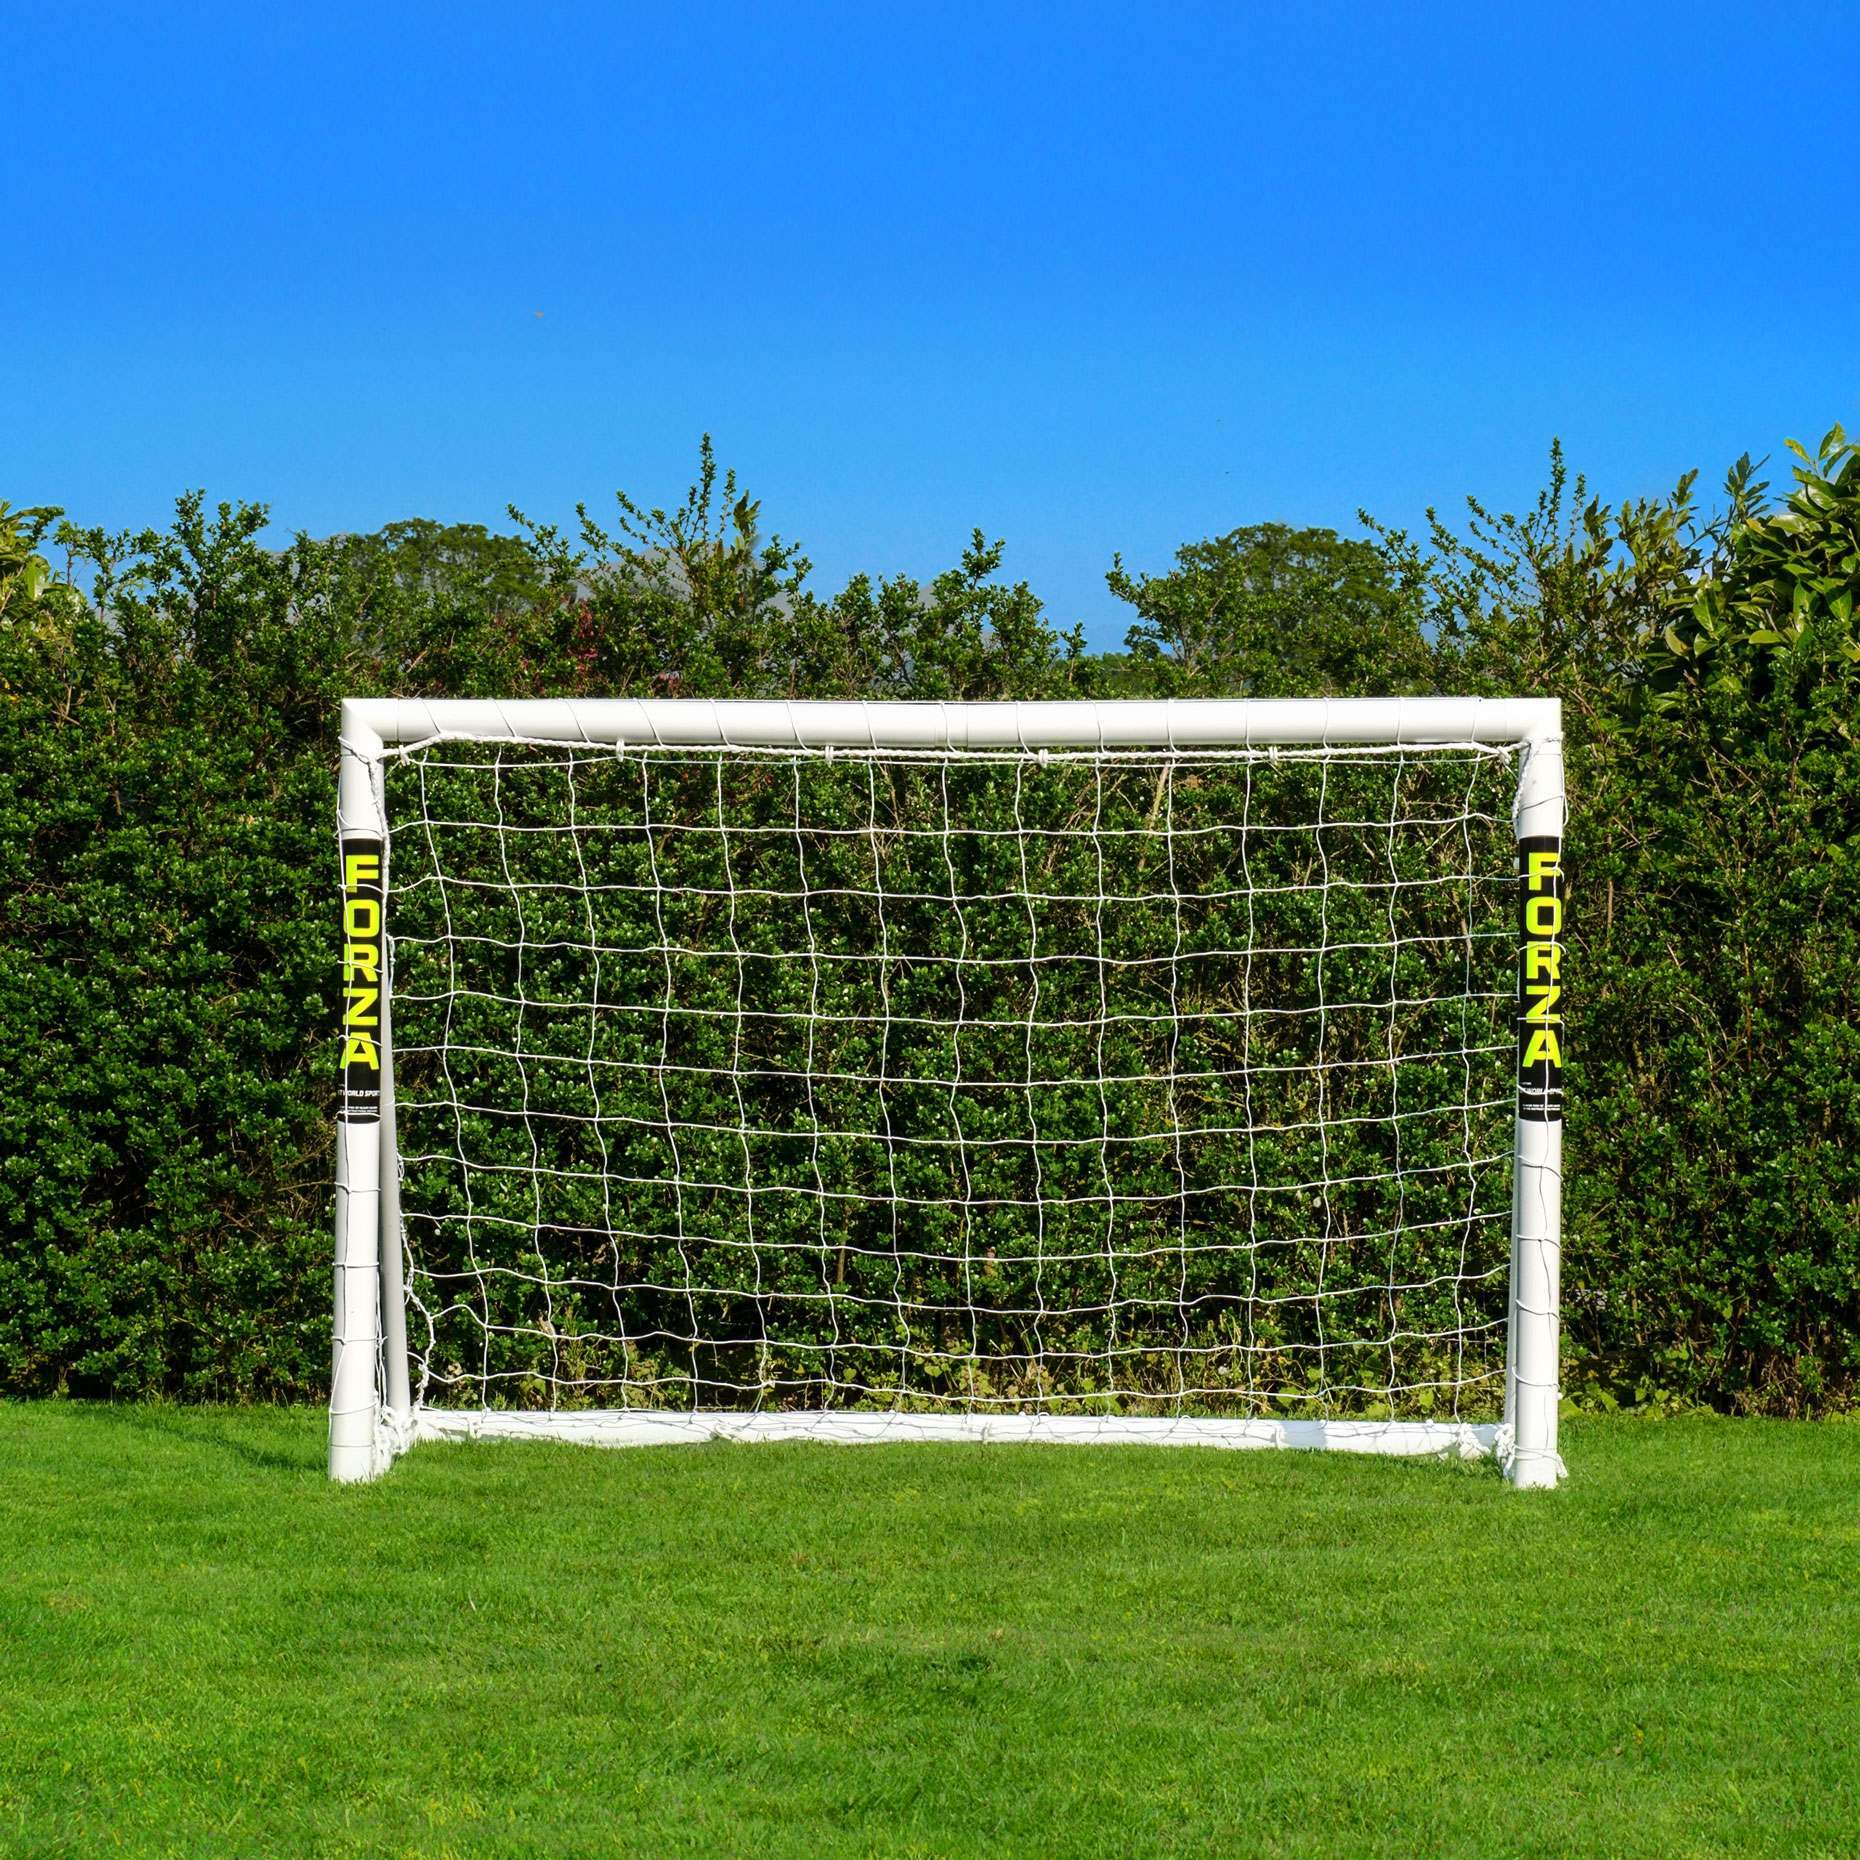 6 x 4 FORZA Football Goal Post